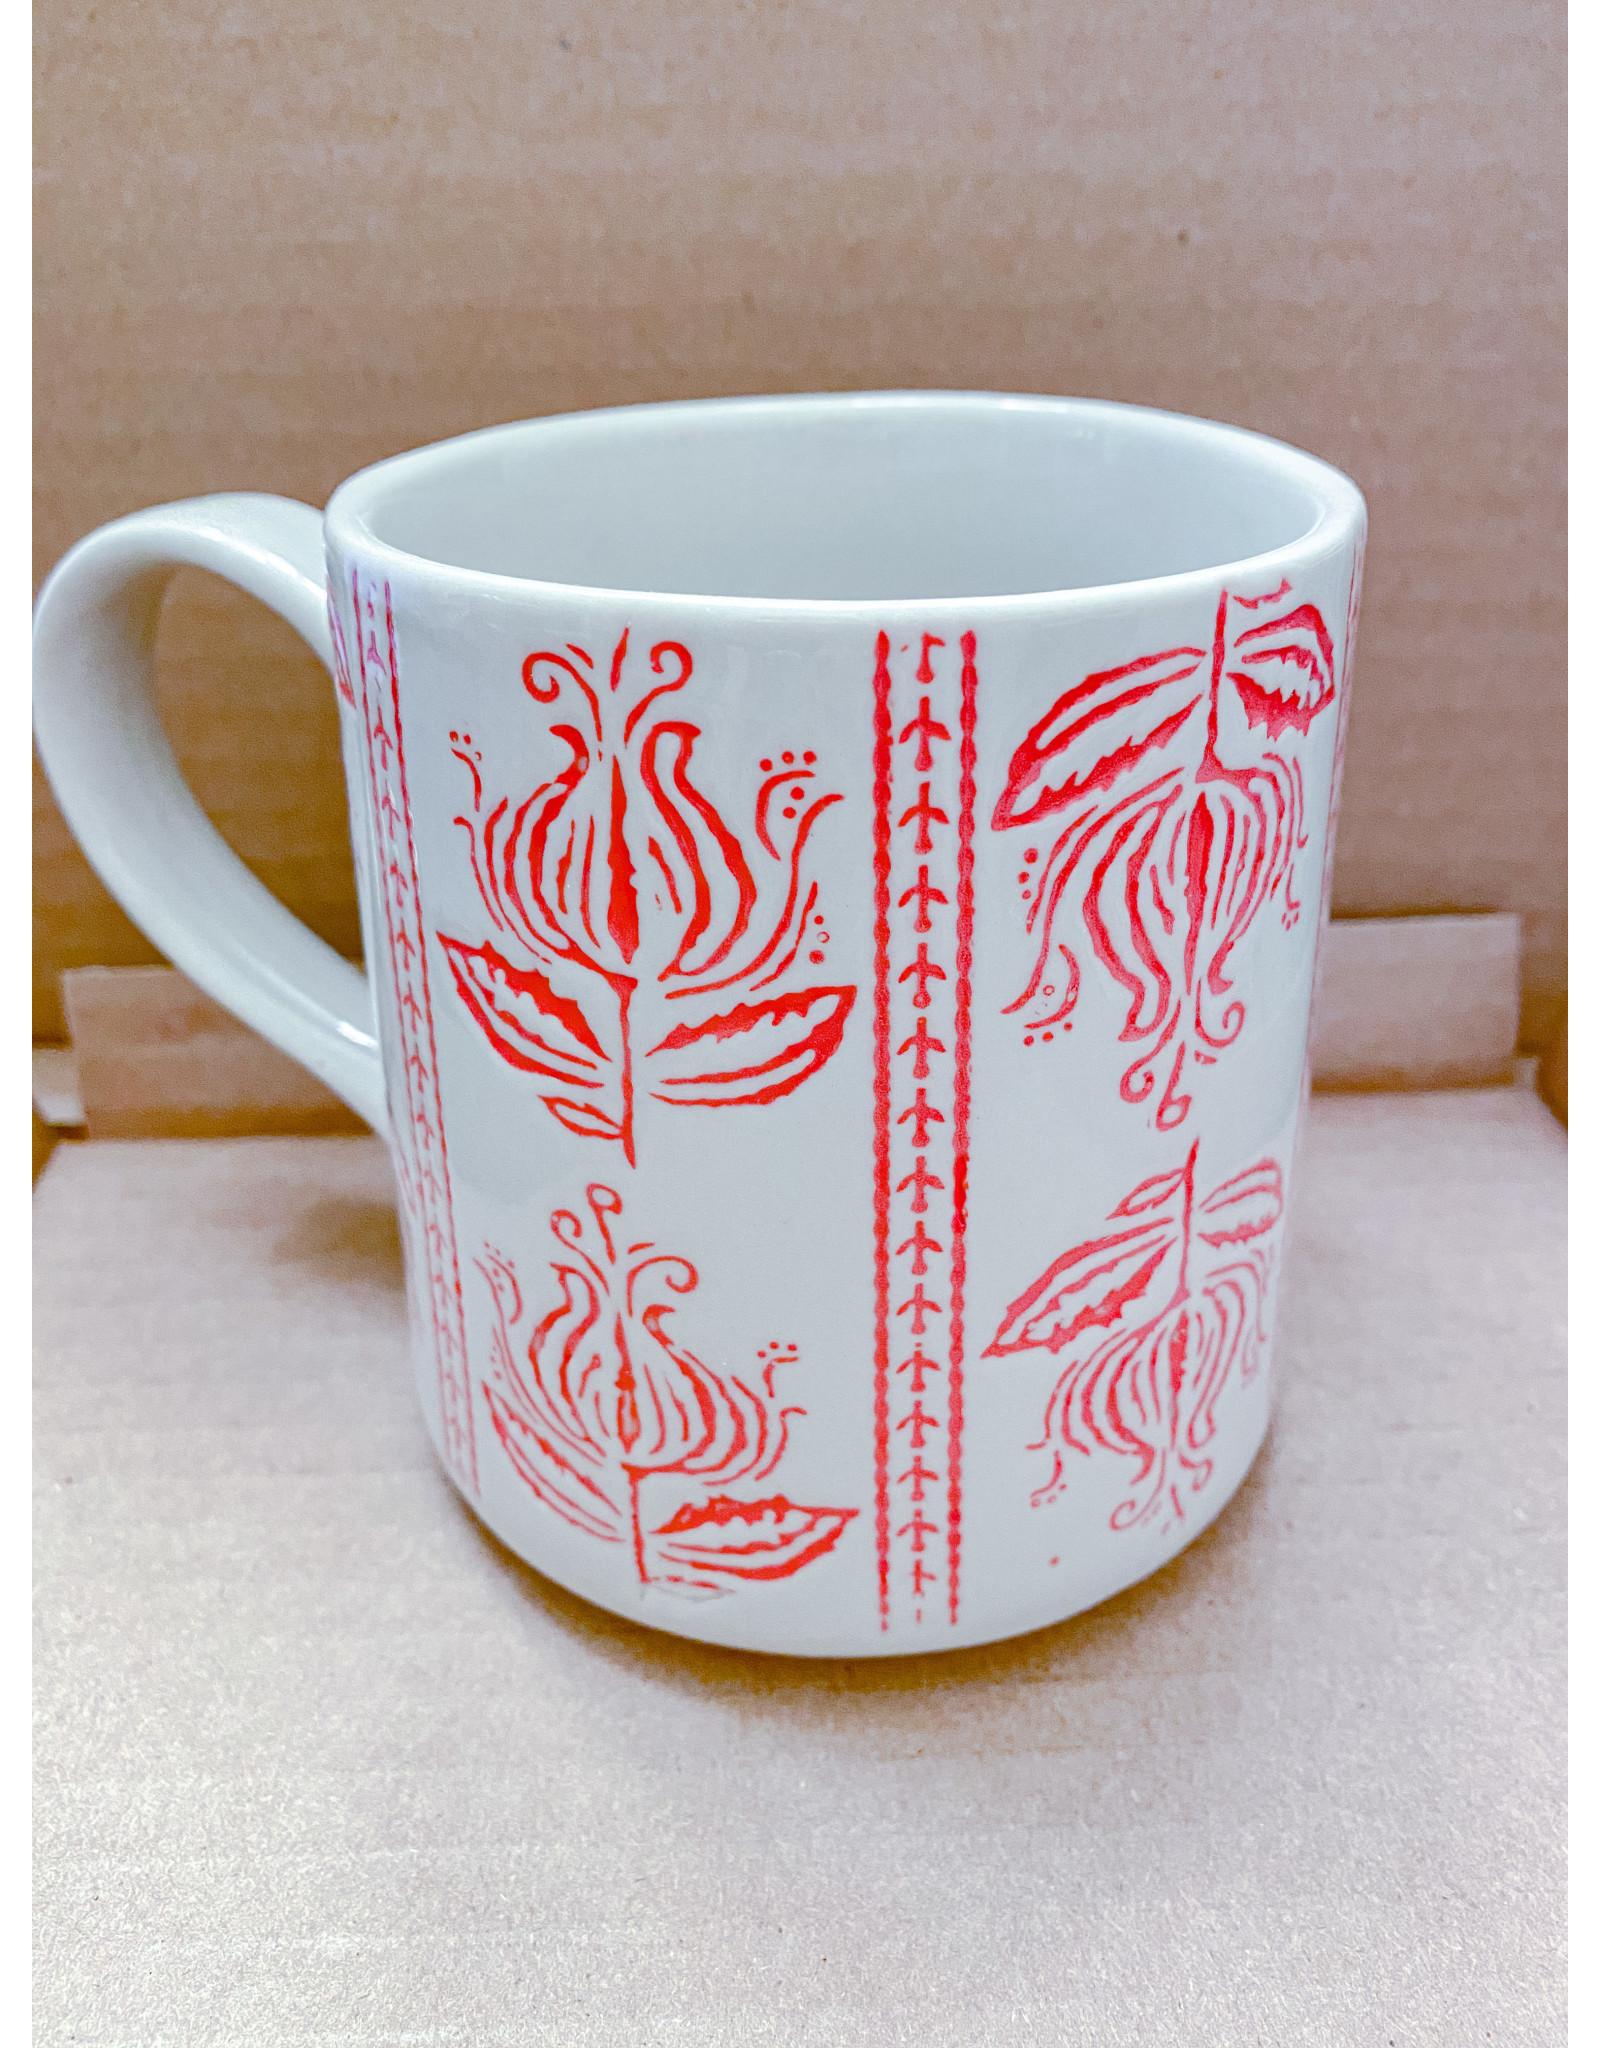 Creative Co-op 16oz Embossed Stoneware Mug - Bright Red